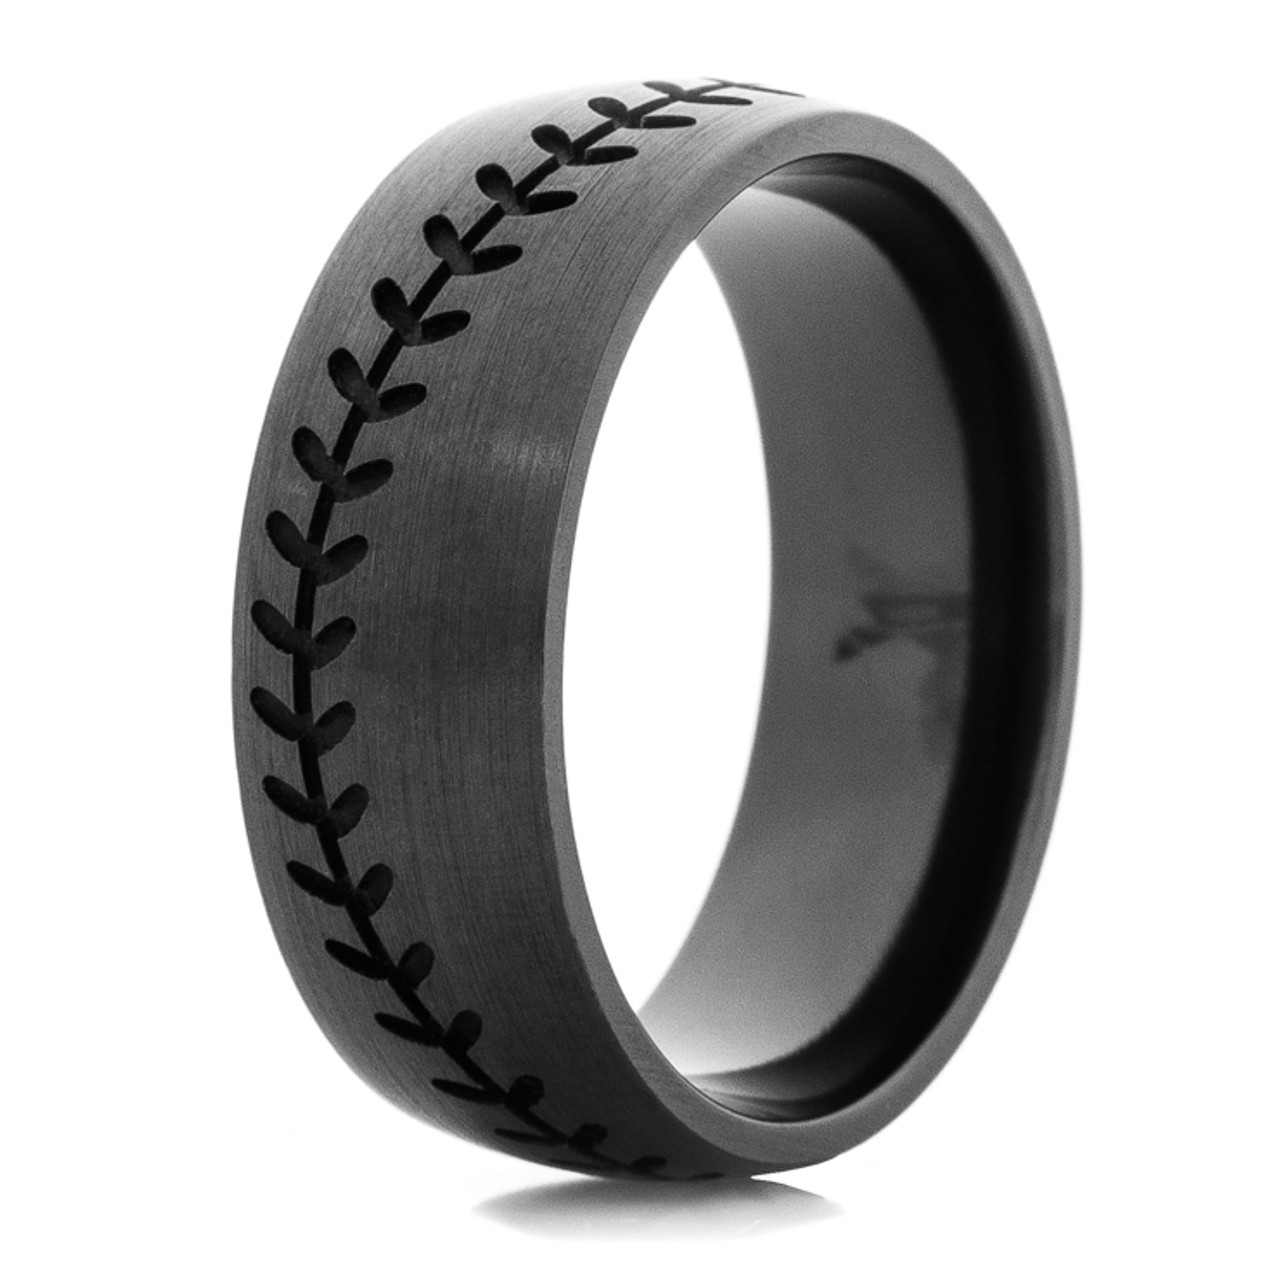 Mens Blacked Out Baseball Wedding Band Titanium Buzz